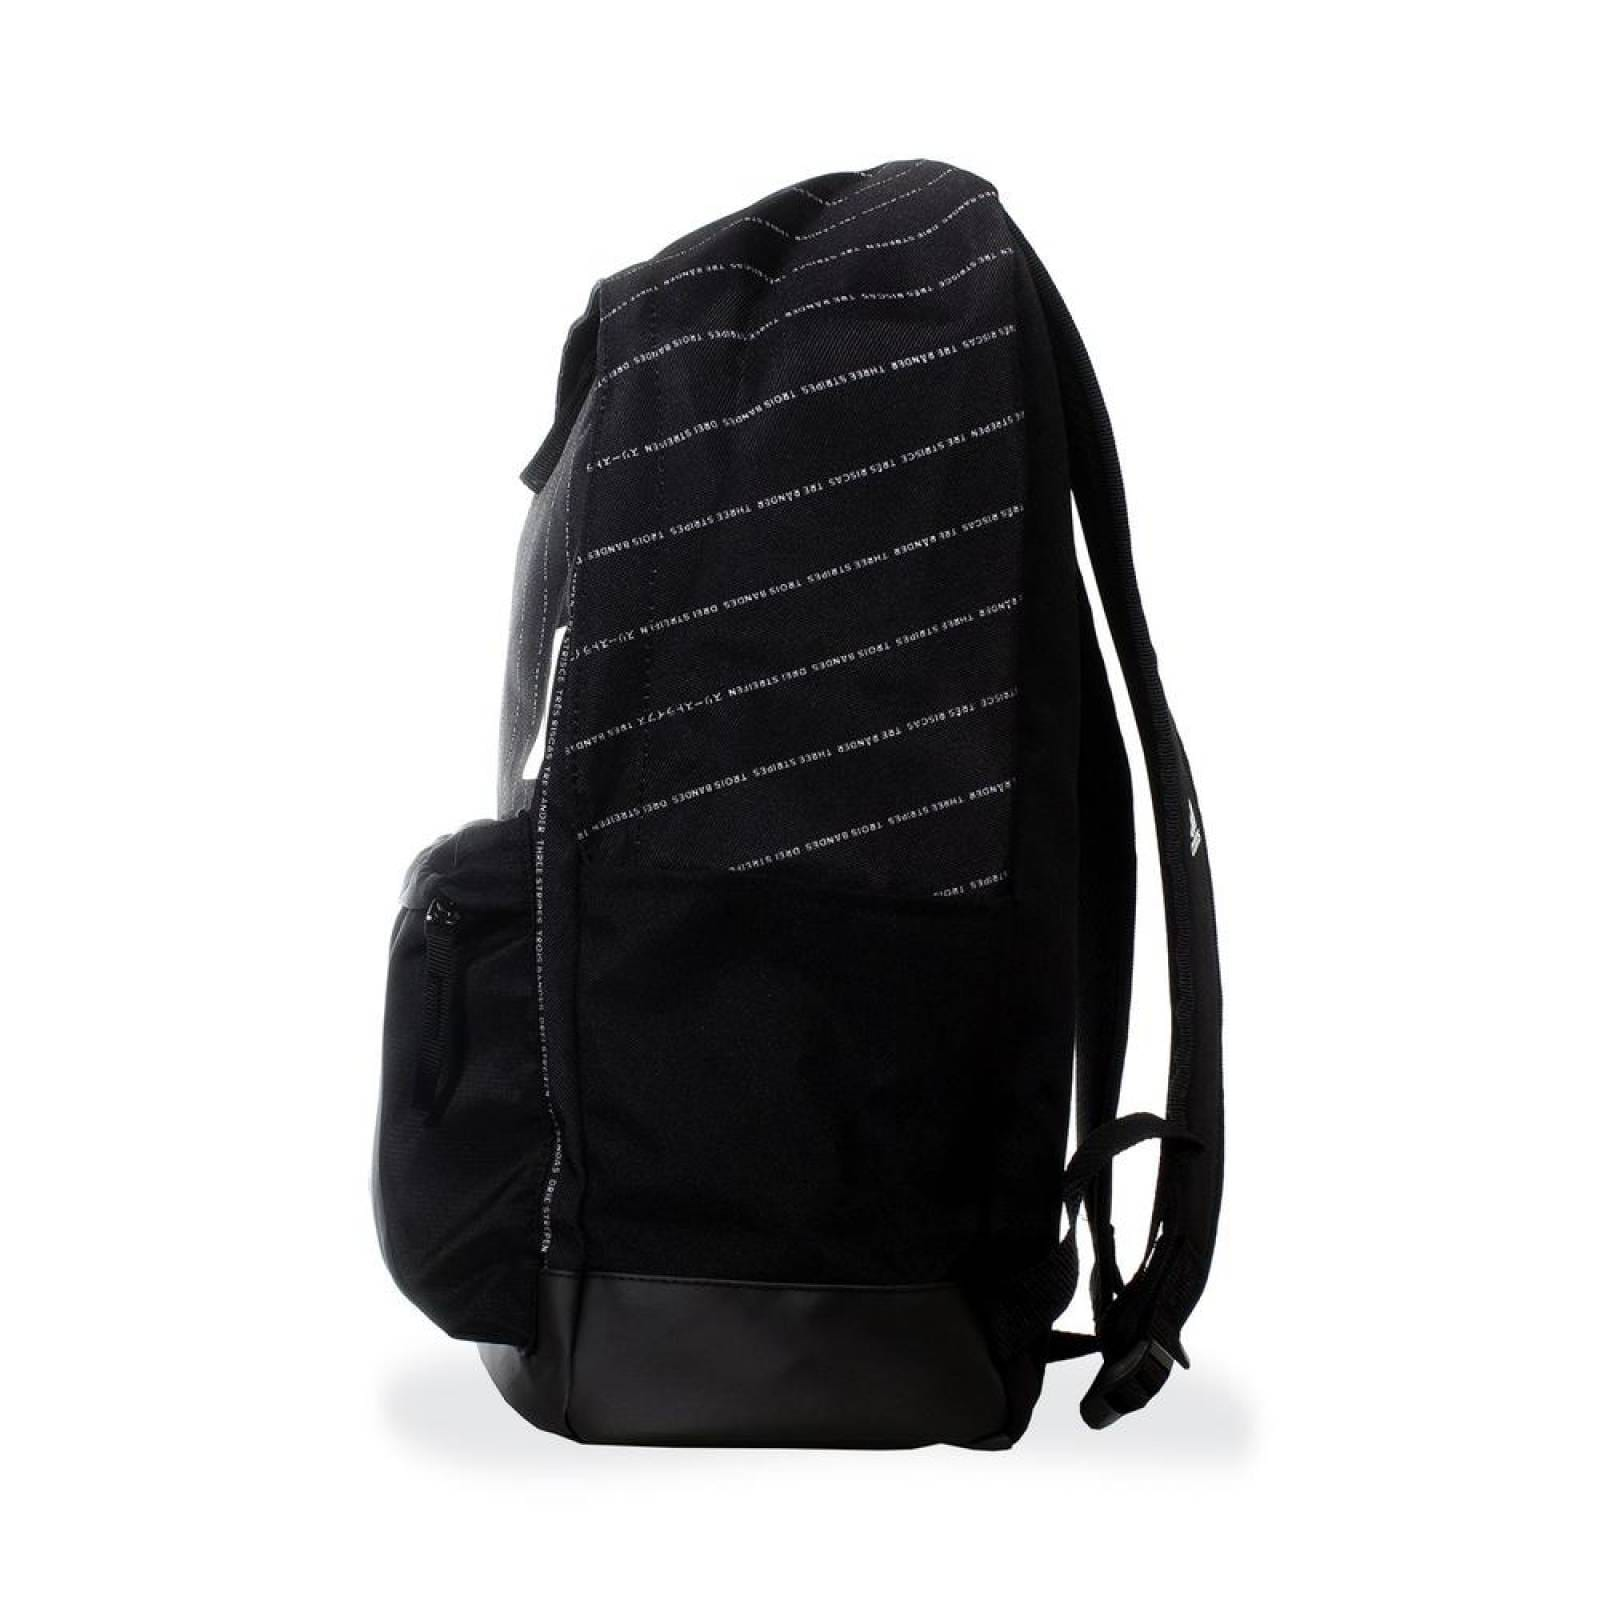 Mochila Adidas Classic Pocket CY7017 Negro Unisex